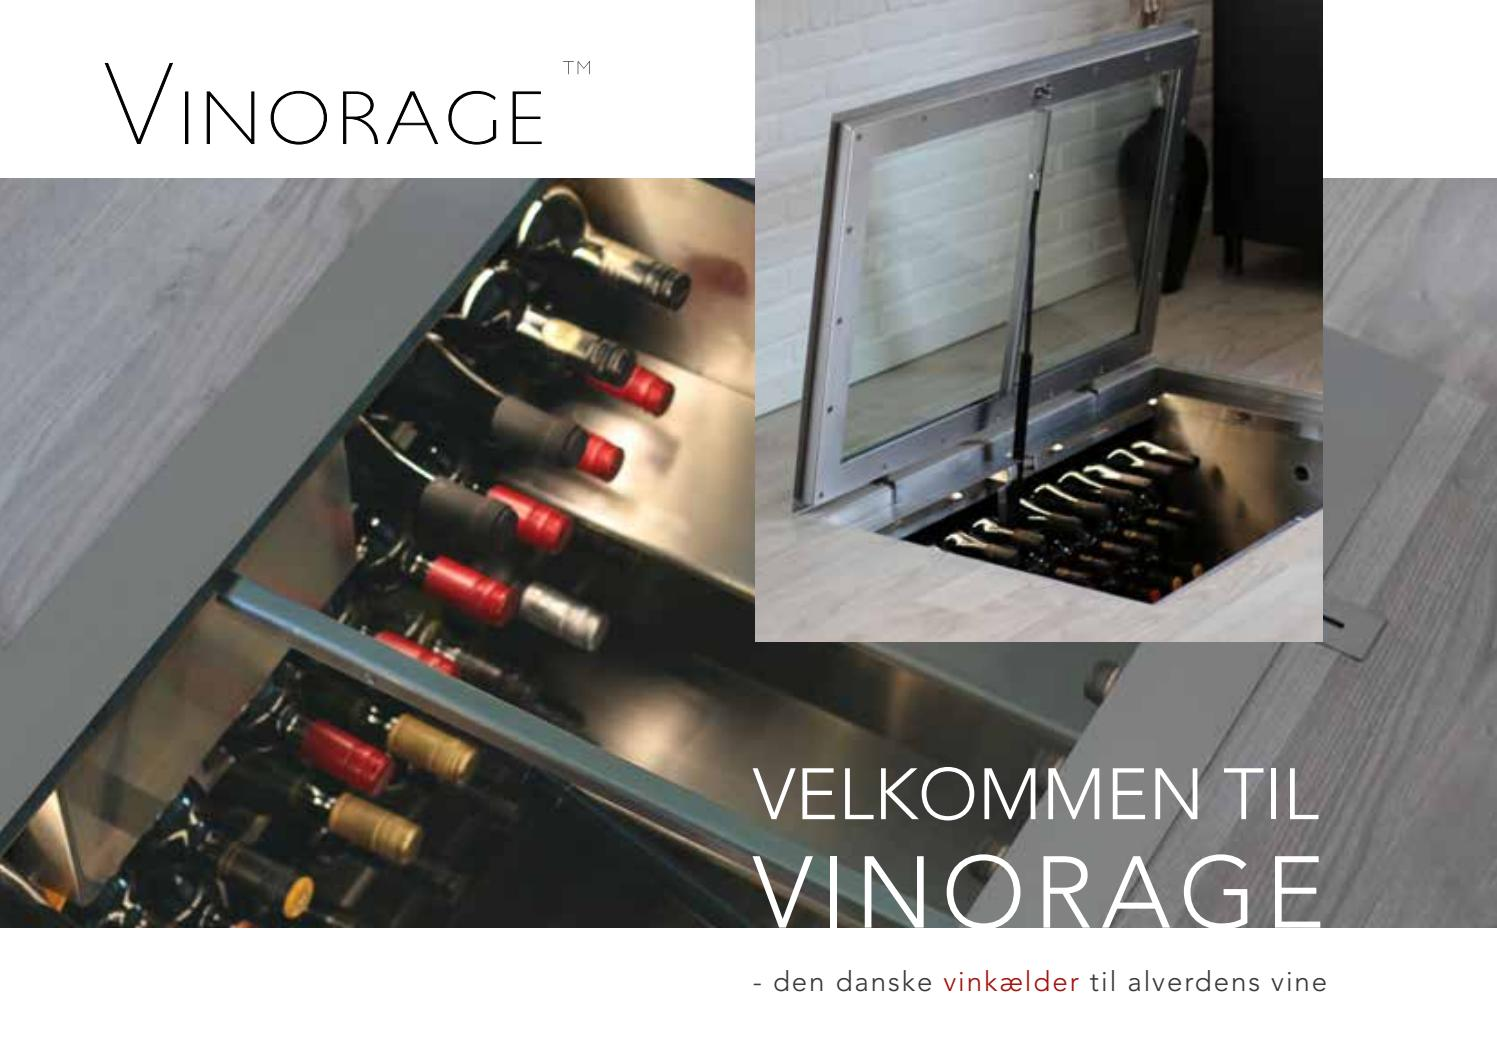 Vinorage By Bettina Kjaer Ringtved Issuu